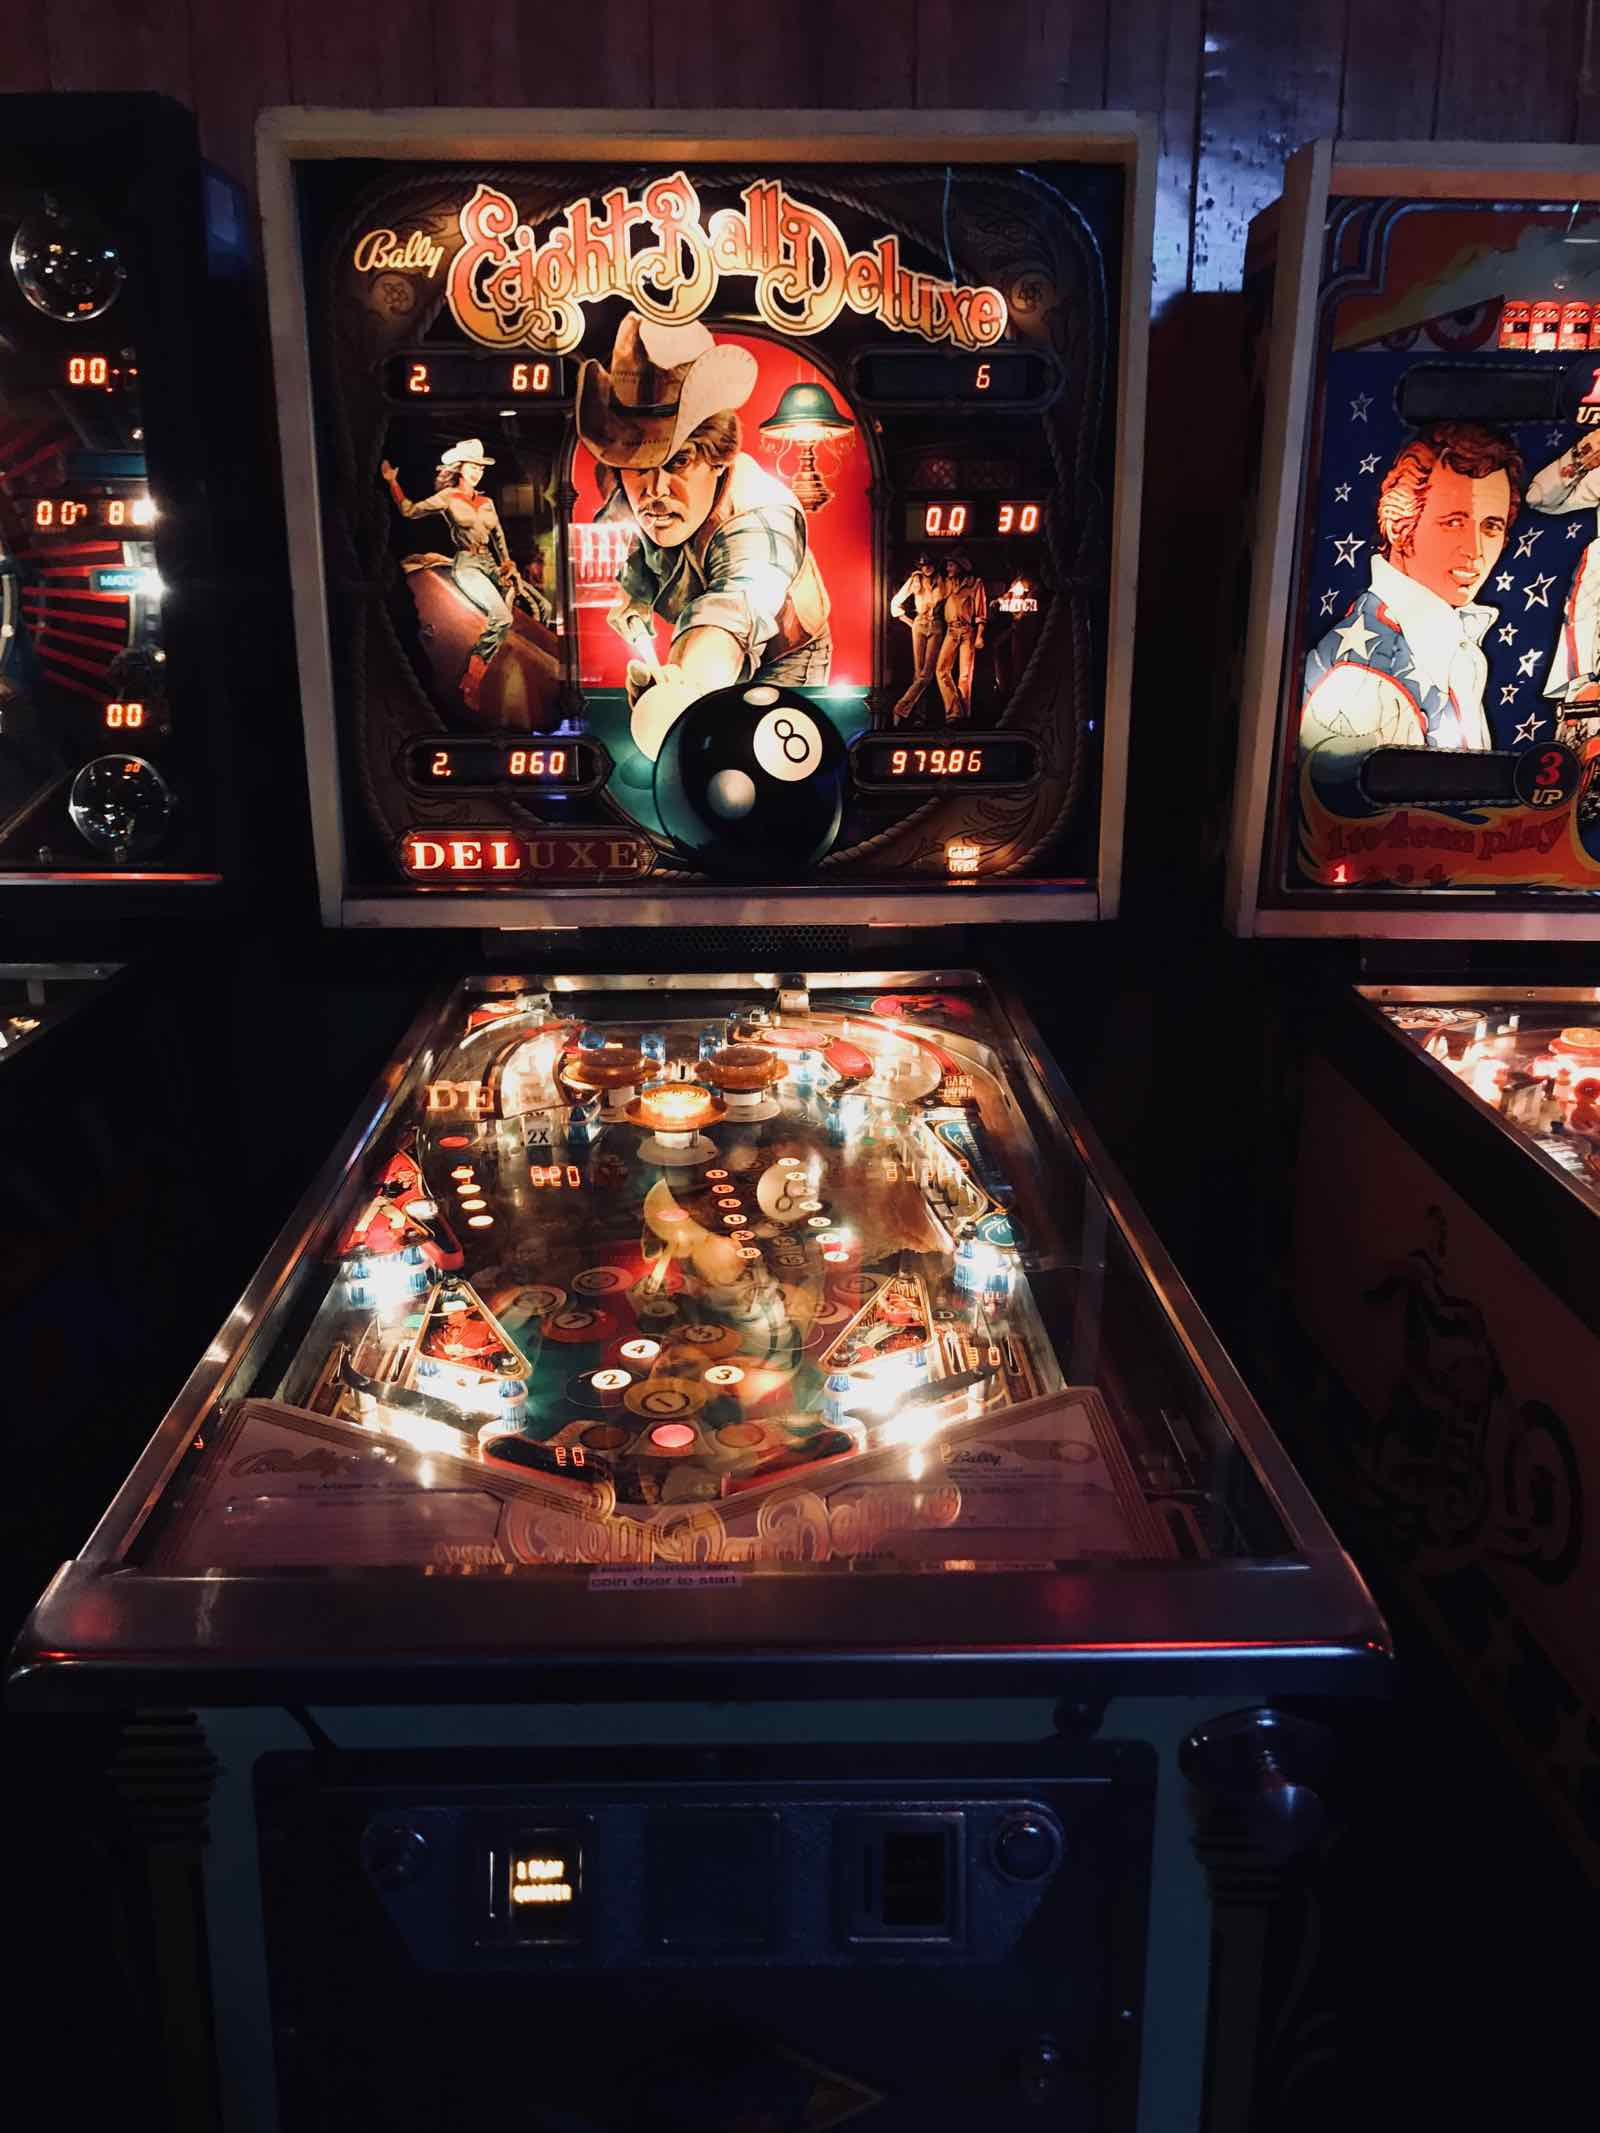 walts-bar-eagle-rock-pinball-7.jpg